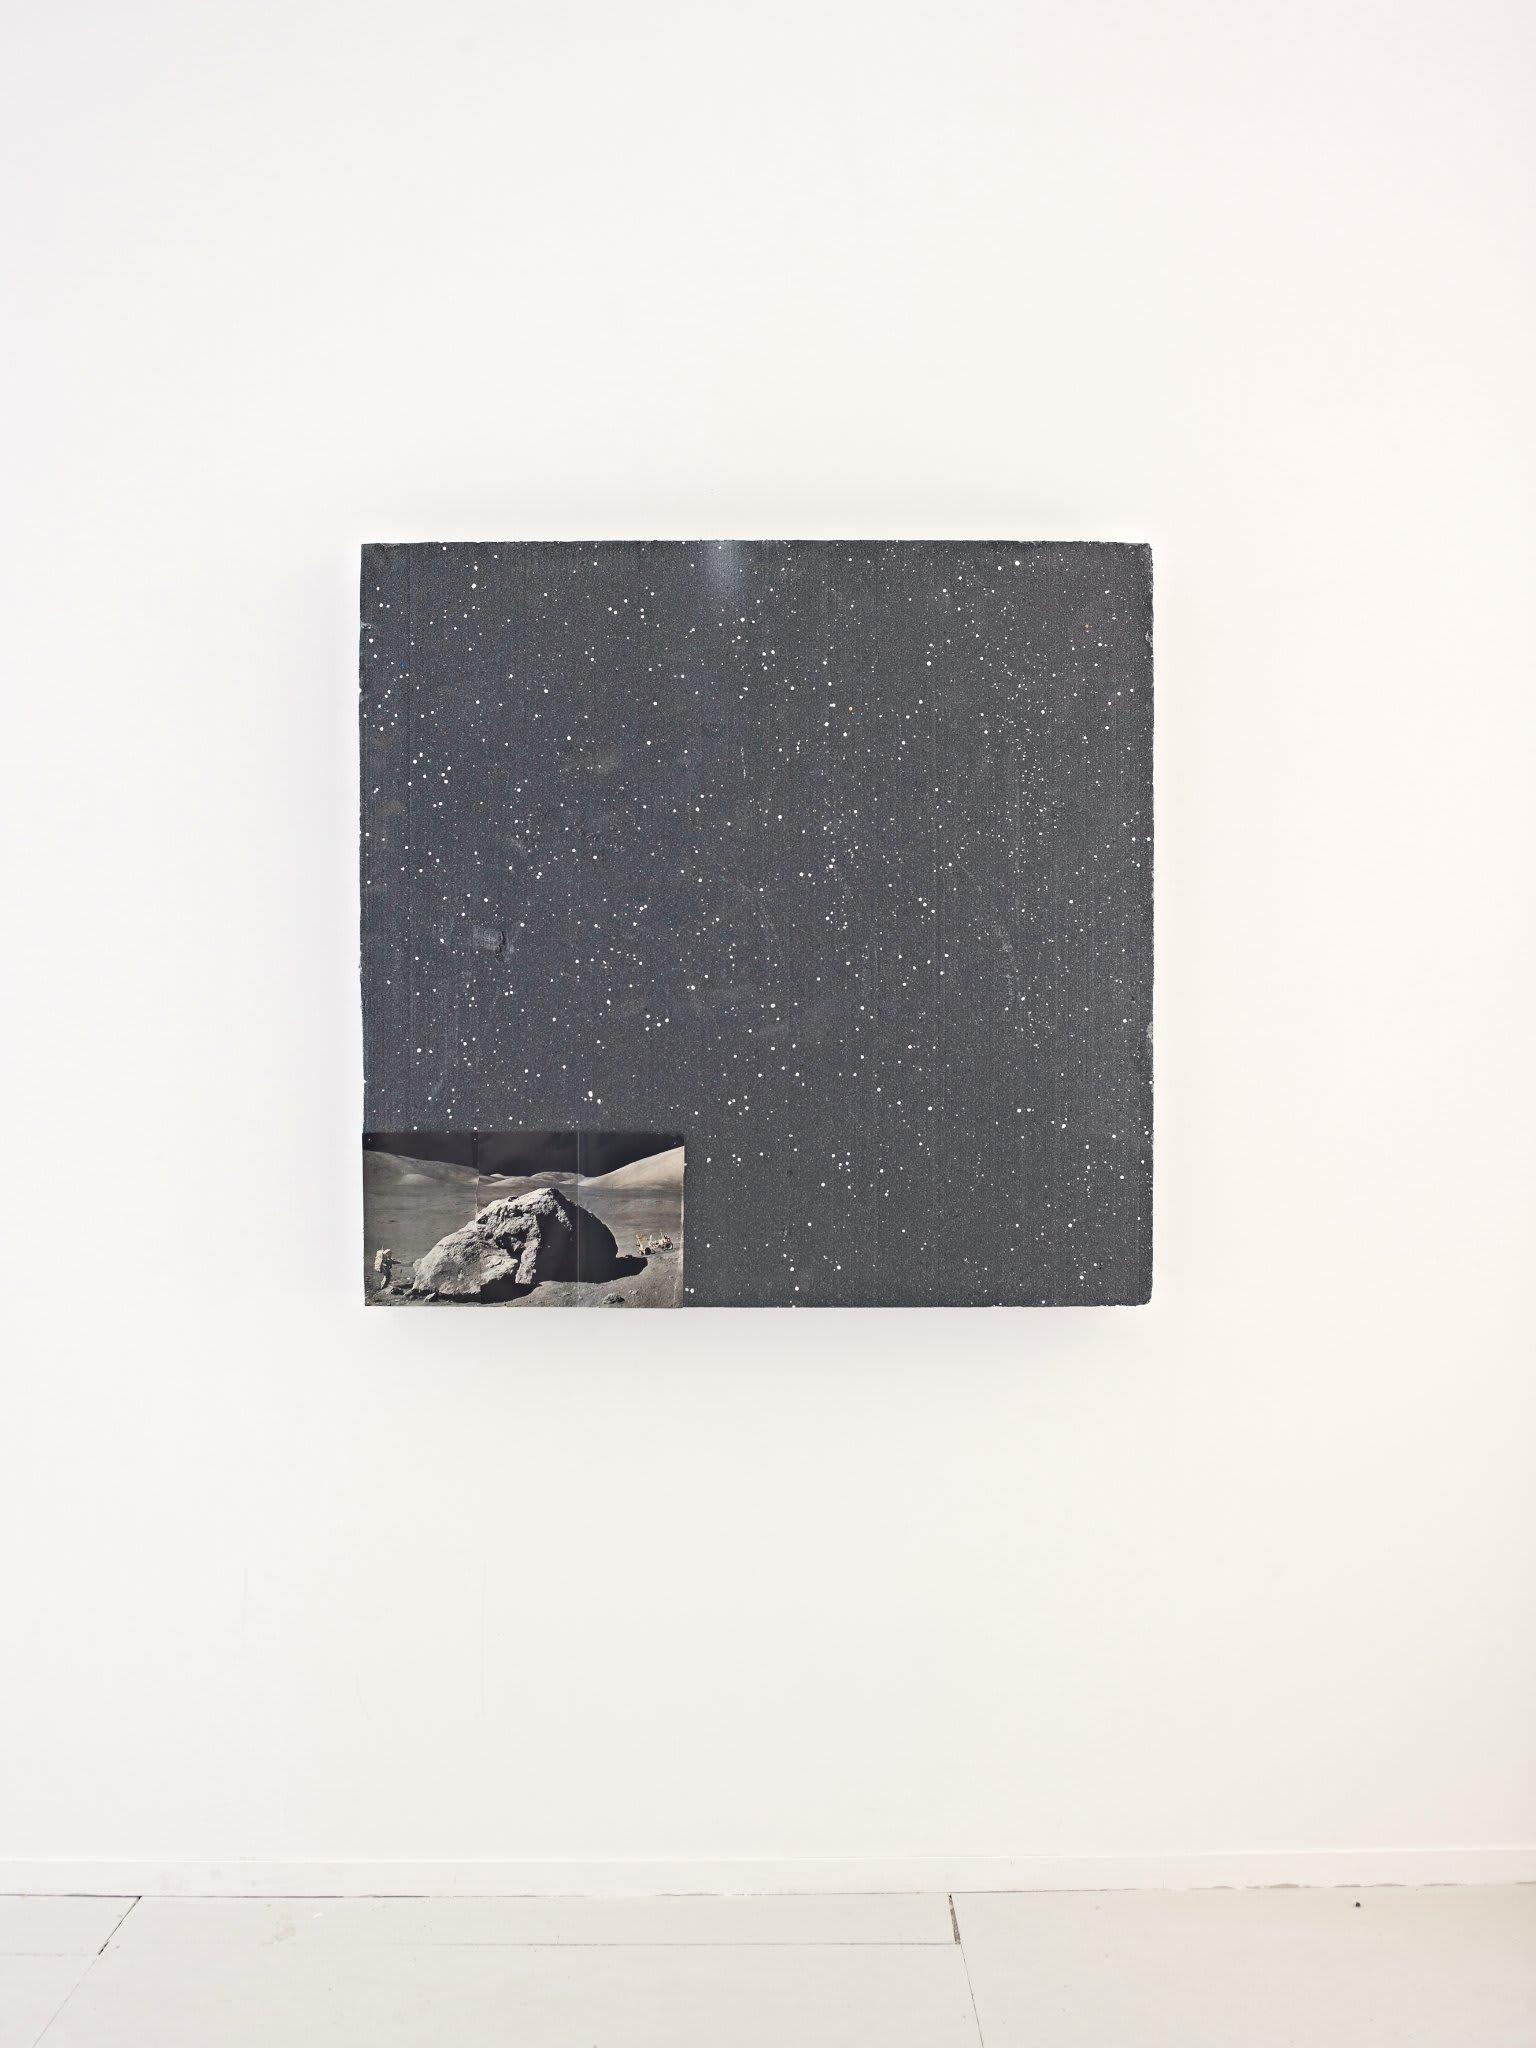 <span class=&#34;link fancybox-details-link&#34;><a href=&#34;/artists/16-paul-merrick/works/8249/&#34;>View Detail Page</a></span><div class=&#34;artist&#34;><strong>Paul Merrick</strong></div> <div class=&#34;title&#34;><em>Untitled (Moon Rock)</em>, 2013</div> <div class=&#34;medium&#34;>Polystyrene, found image, dressmaker pins, berry pins</div> <div class=&#34;dimensions&#34;>115 x 111 x 10 cm<br />45 1/4 x 43 3/4 x 4 in</div><div class=&#34;copyright_line&#34;>Copyright The Artist</div>